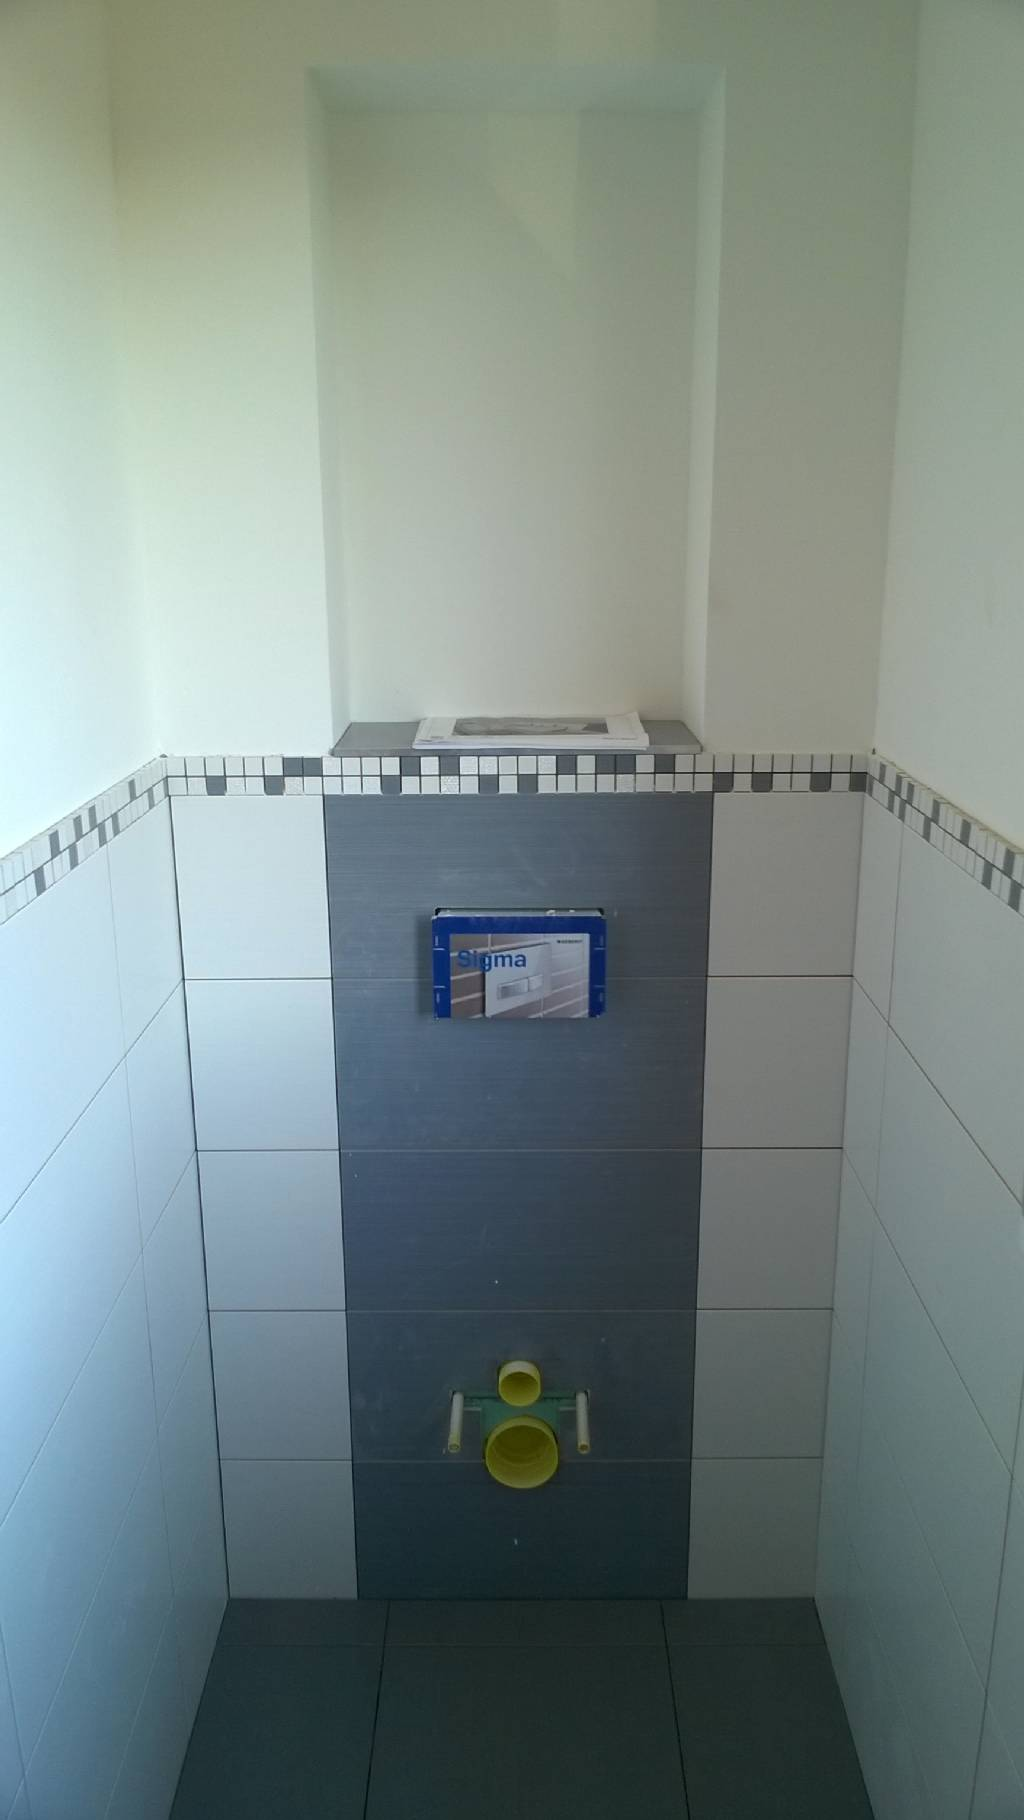 Fliesenhöhe Bad/Fliesenleger OÖ-Tips? | Bauforum auf energiesparhaus.at